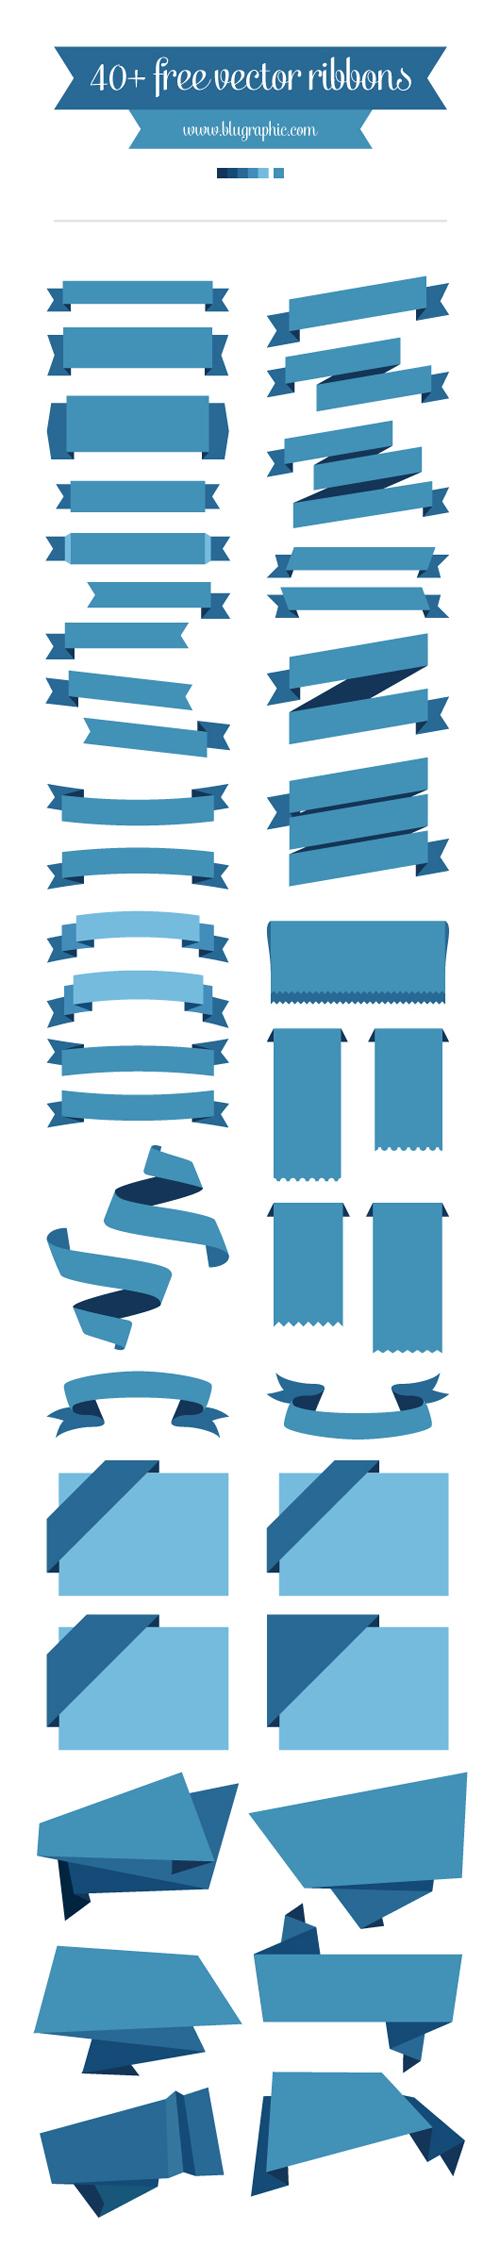 Free Vector Graphics Design - 20